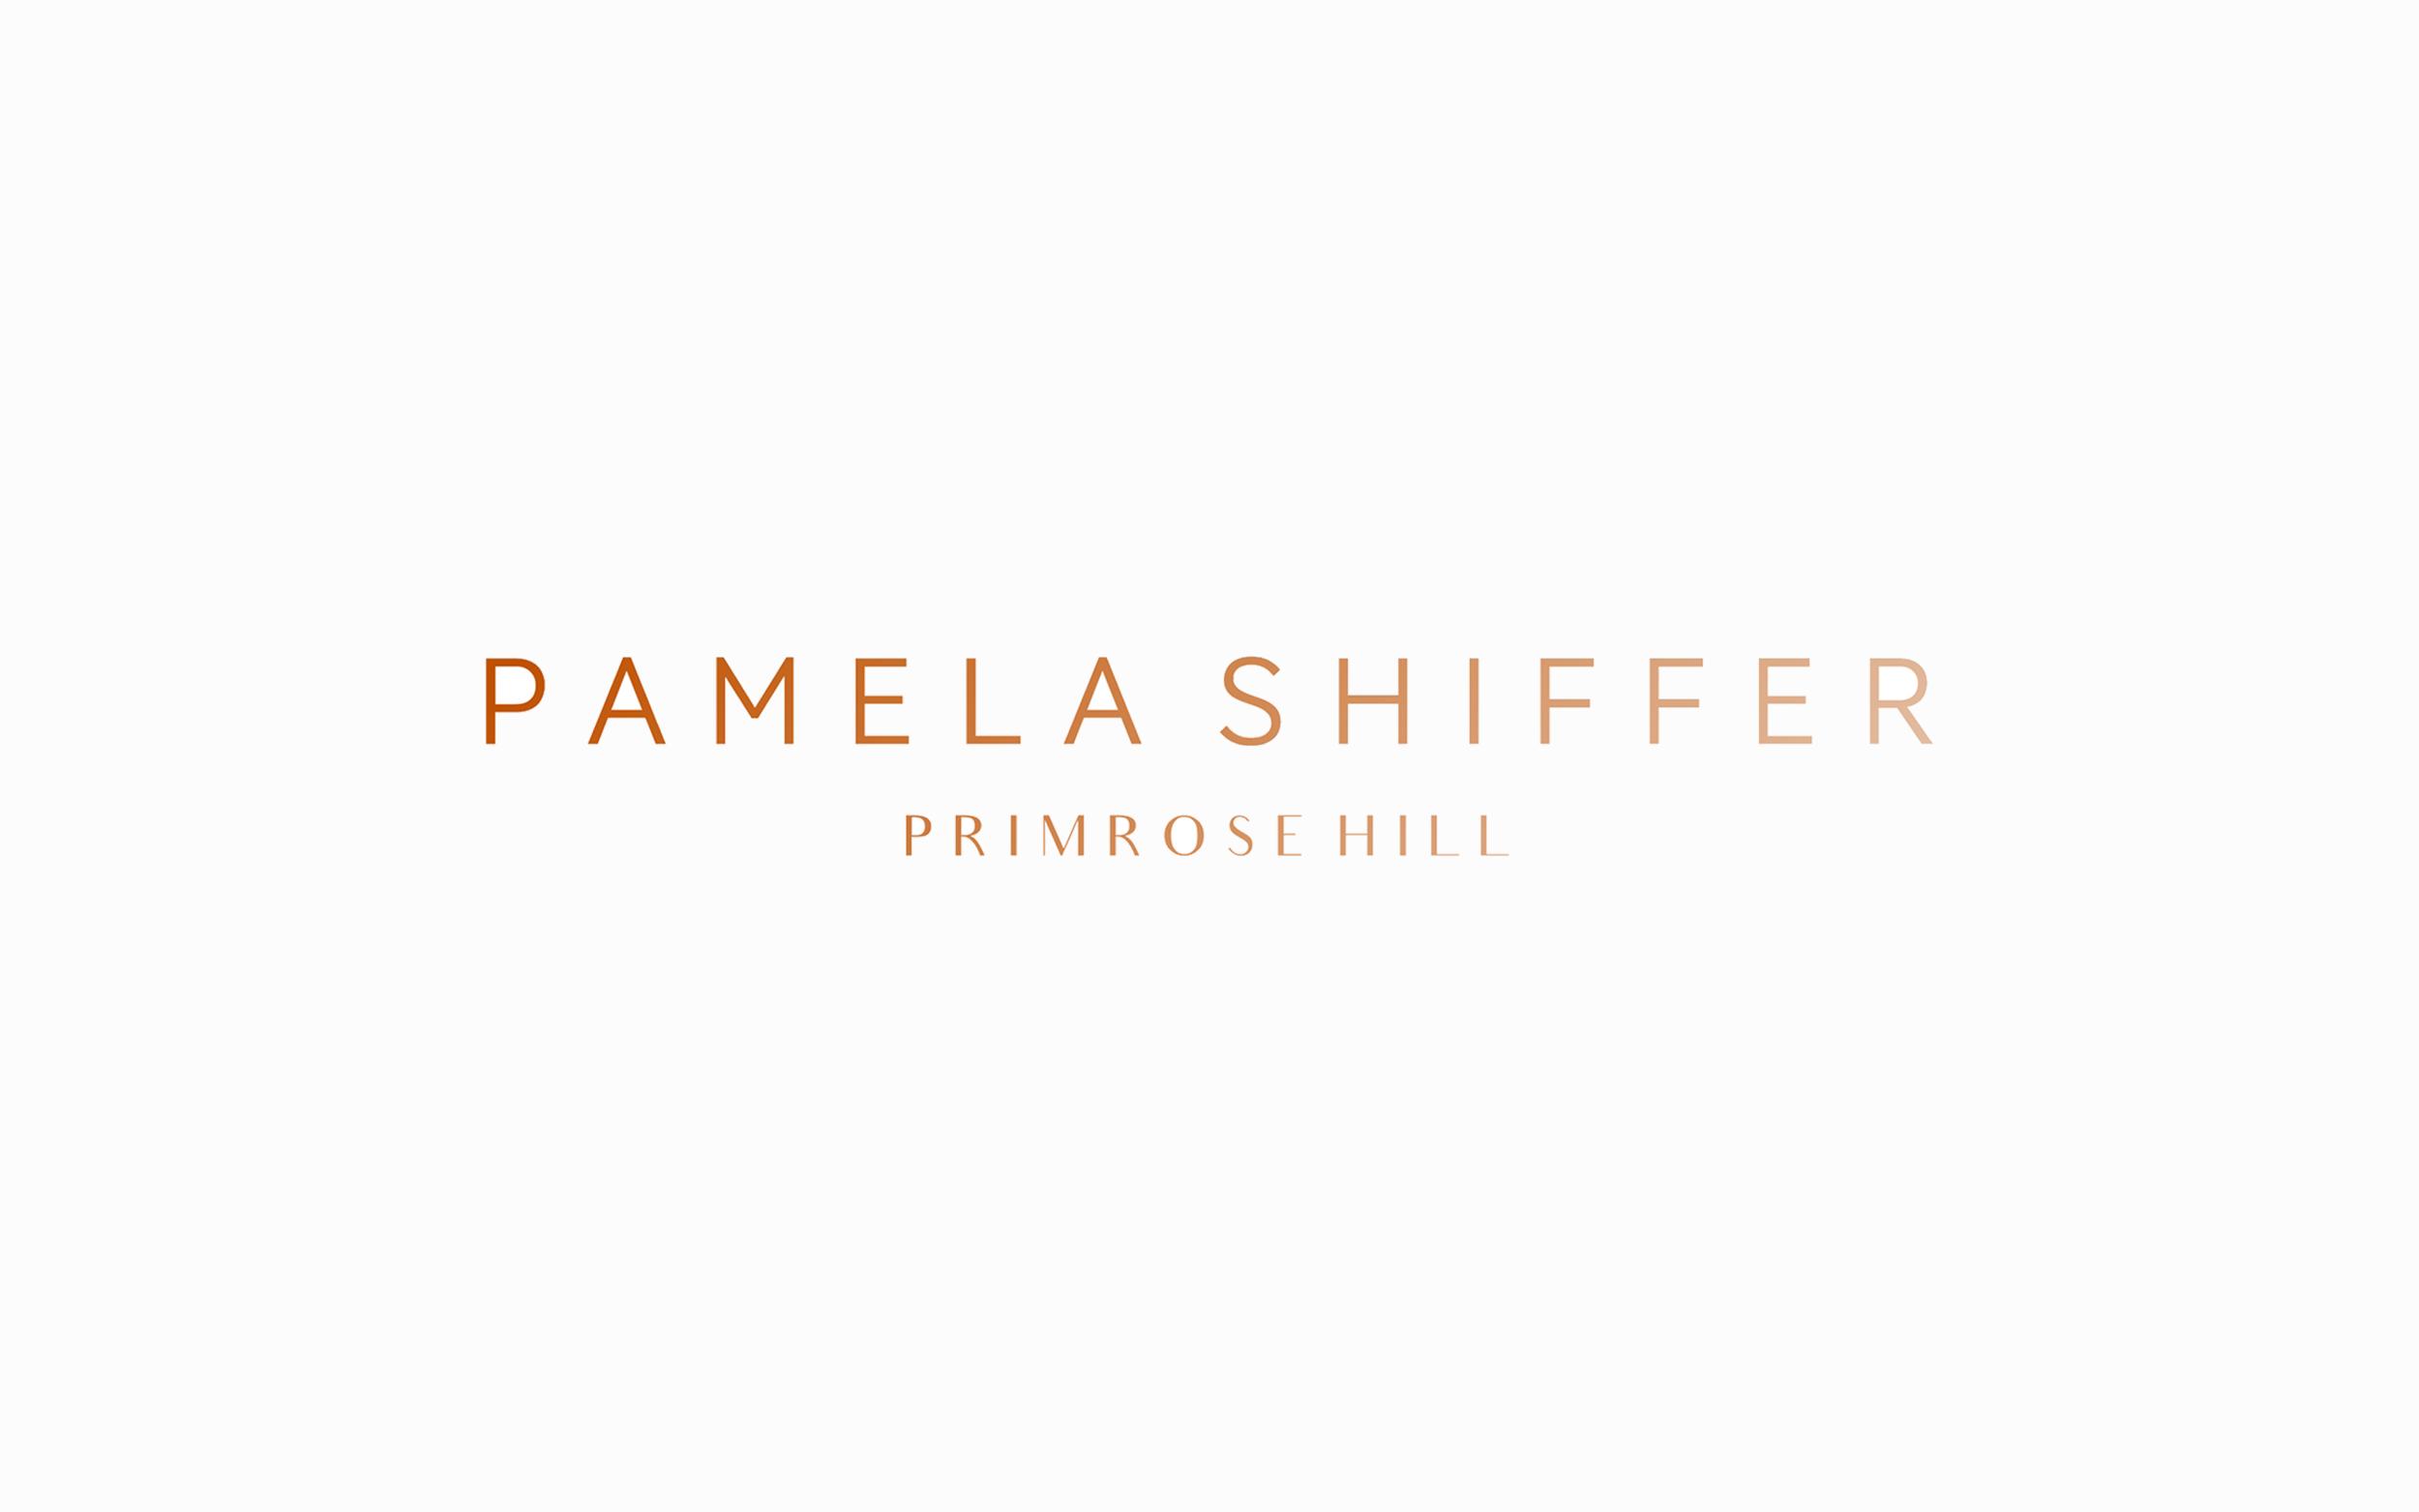 House of Sui Sui - Melissa Bolivar - Pamela Shiffer Primrose Hill. Interior Retail Design 4.png